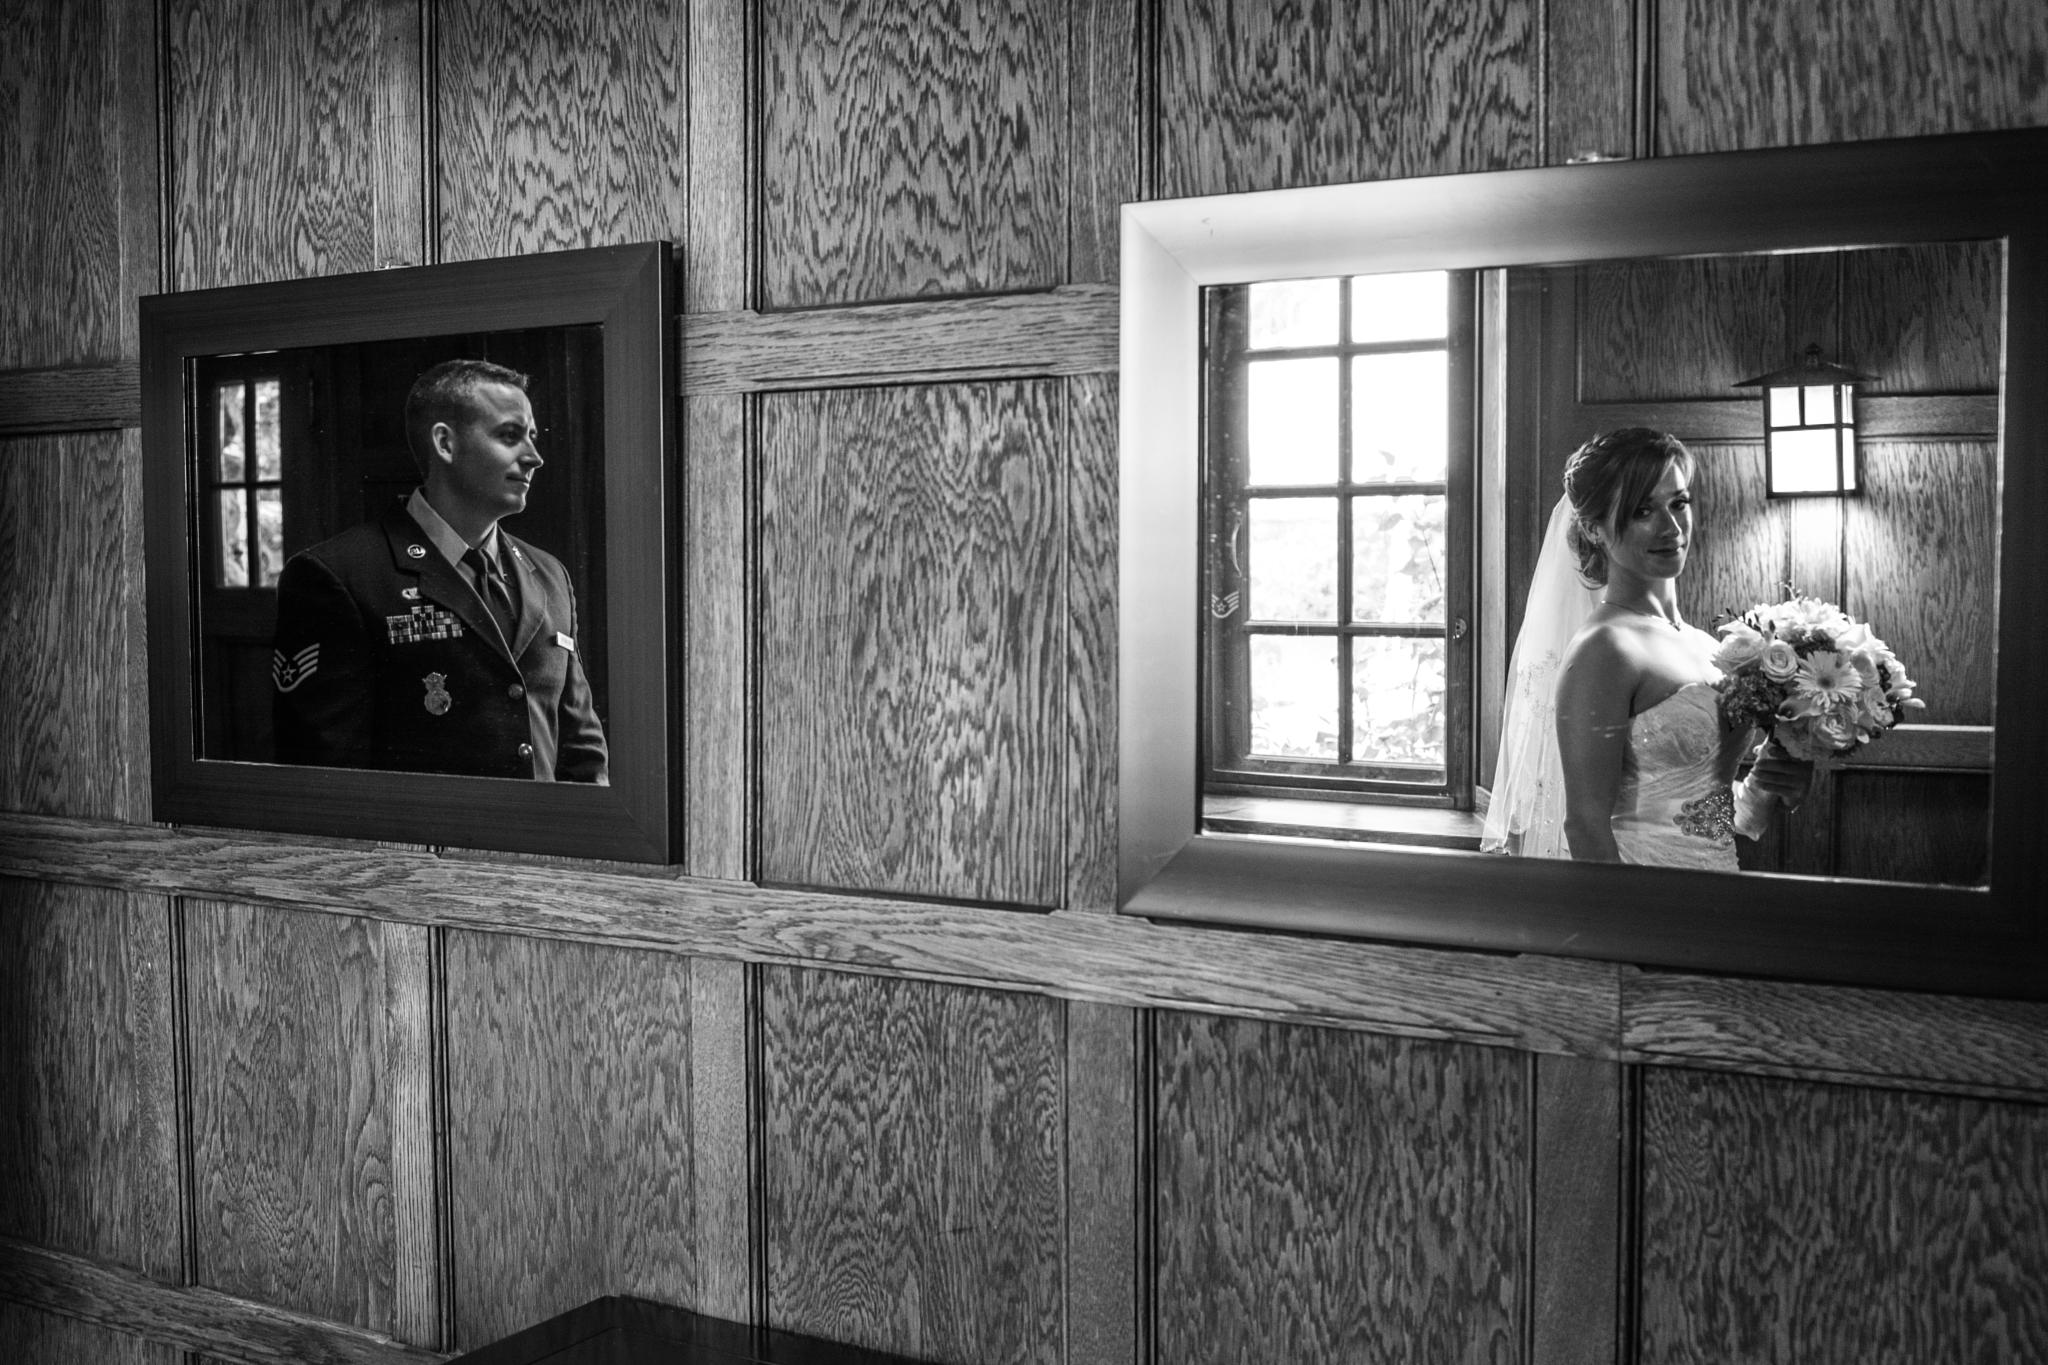 Portraits of Newly weds by RaidenPhotos.com